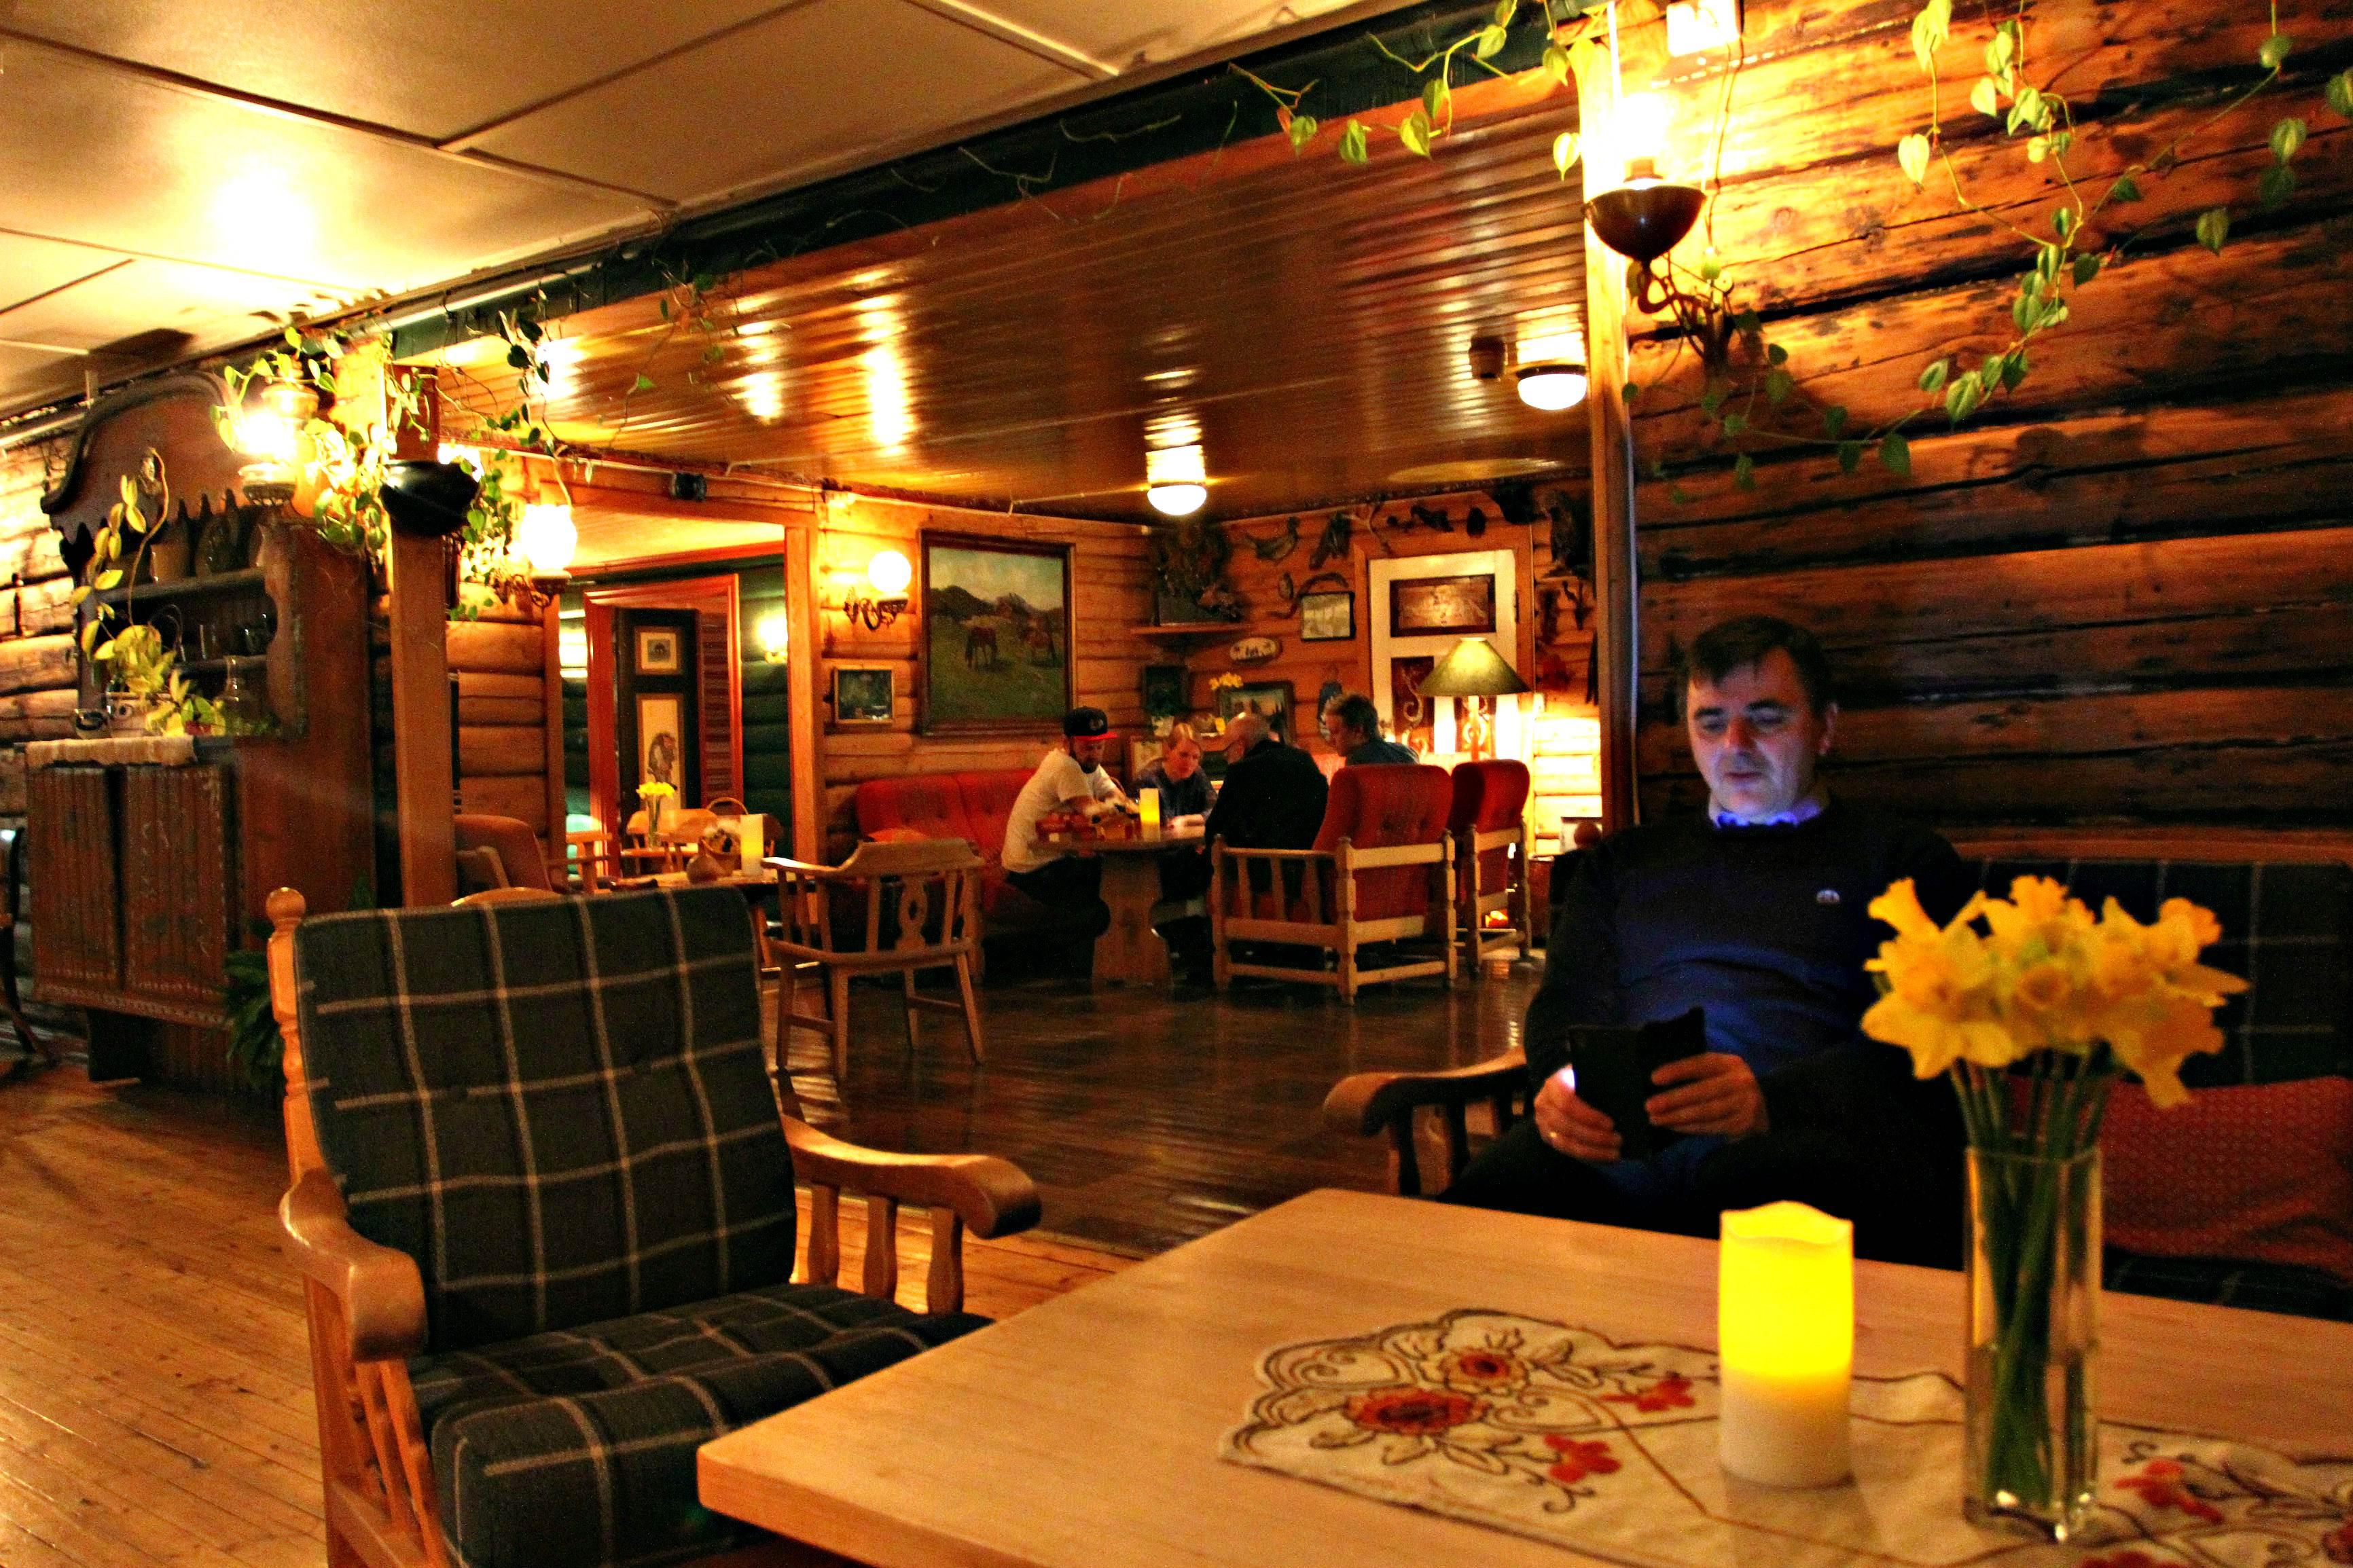 golsfjellet-kamben-hotel-sitting-room